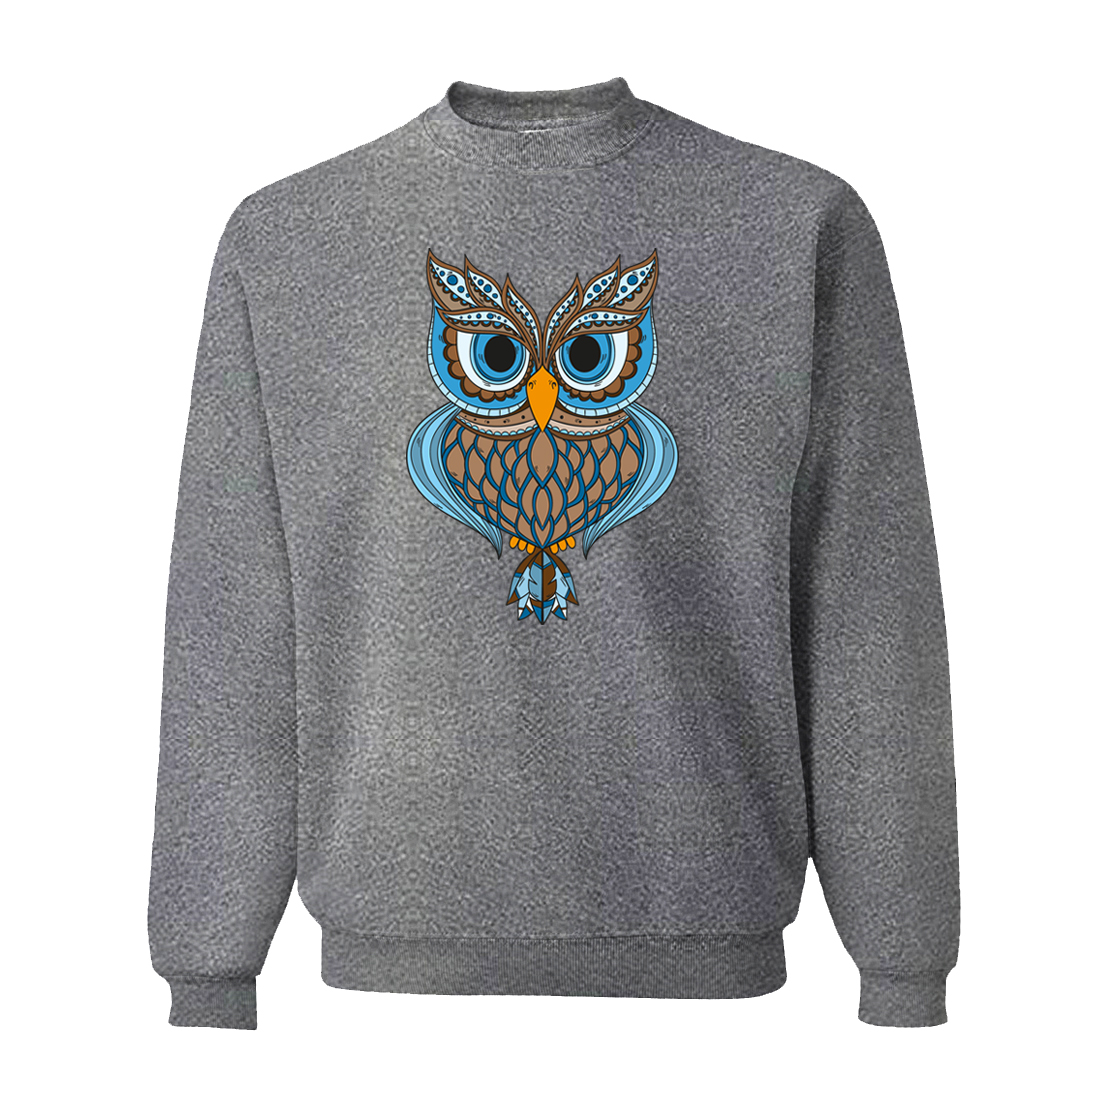 HAMPSON LANQE 2019 Spring Animal Owl Printed Men's Sweatshirts Hoodies Harajuku Fleece Sweatshirt Casual Men Punk Hooded CM01